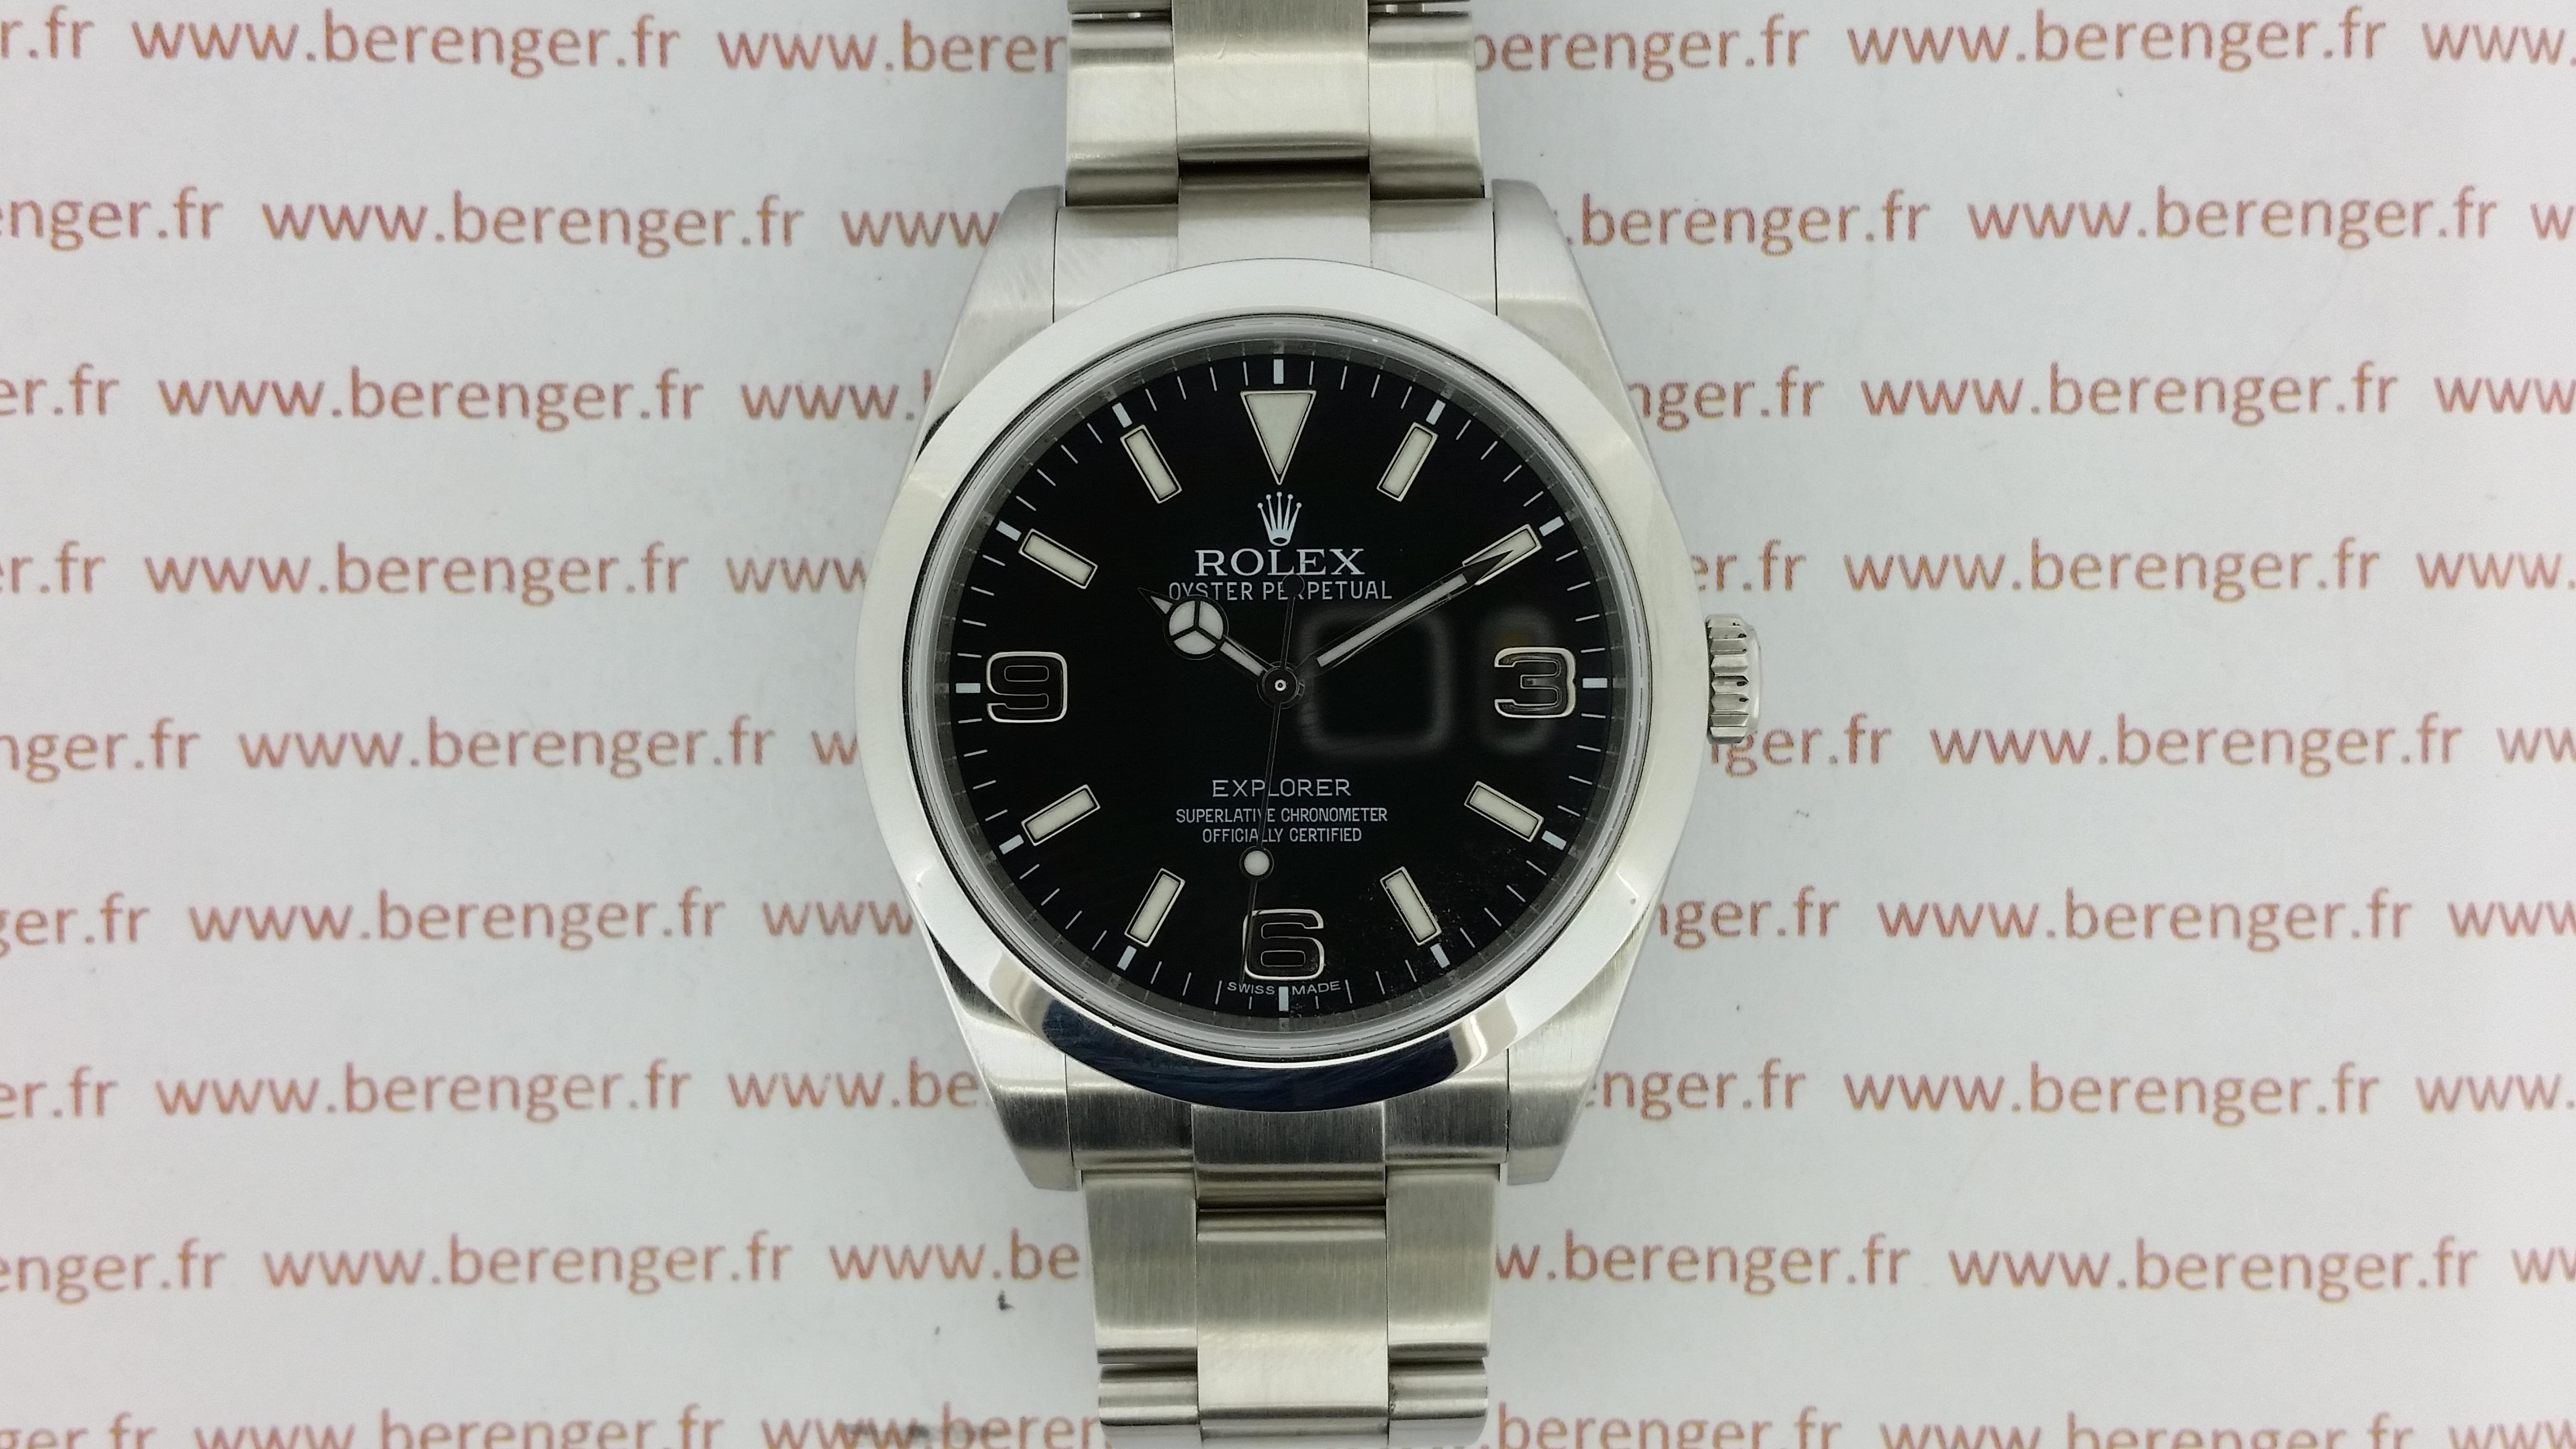 Montre occasion Rolex Explorer I 214270.